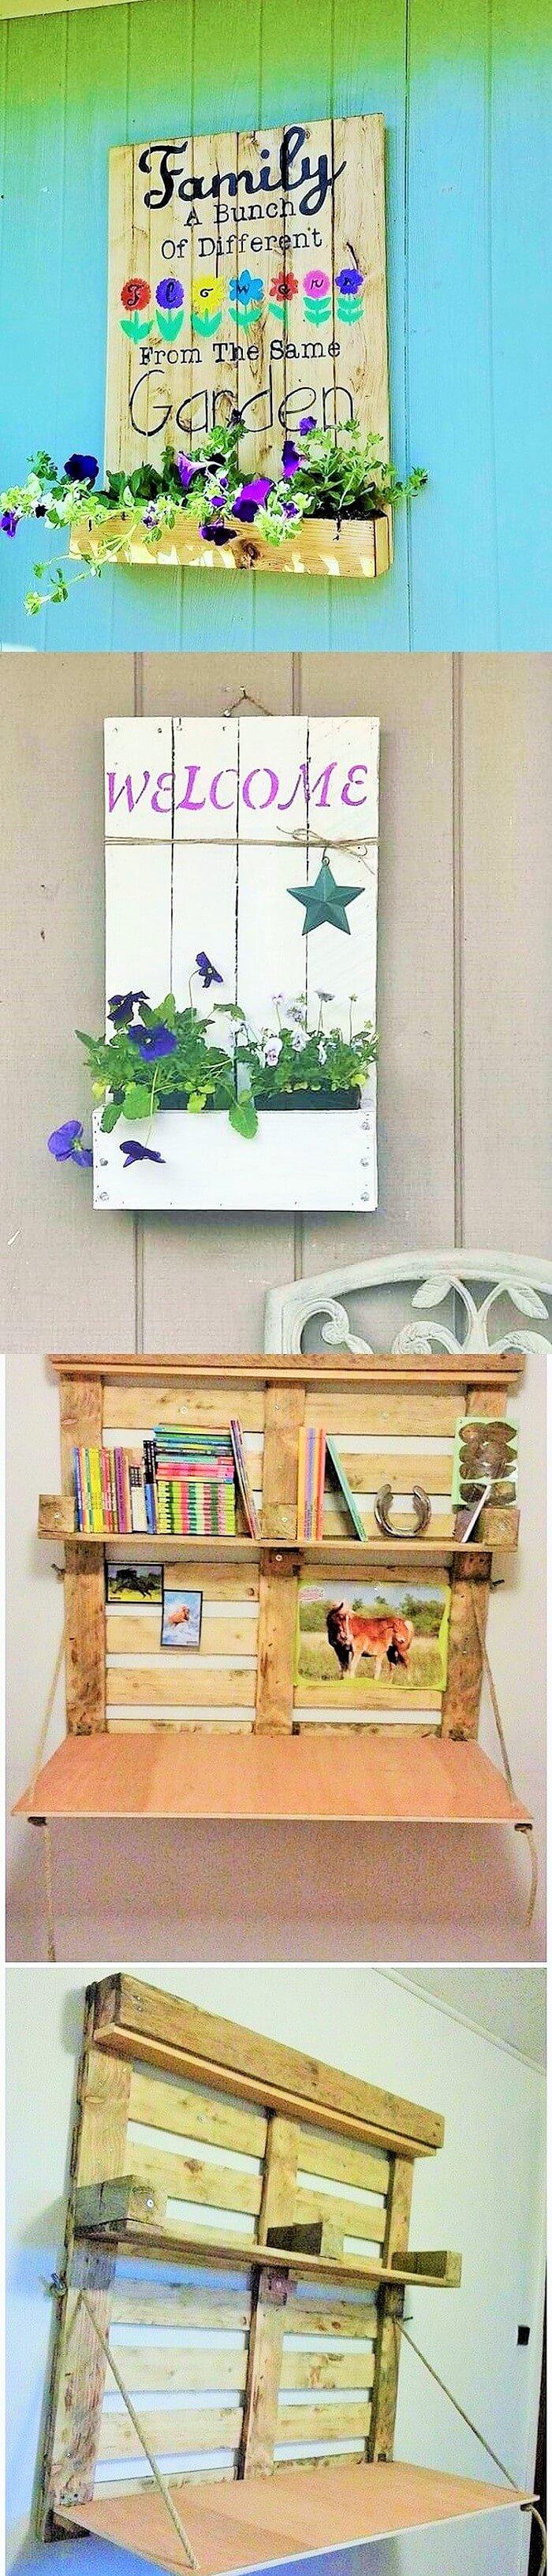 Homemade DIY Pallets Ideas-2 (2)